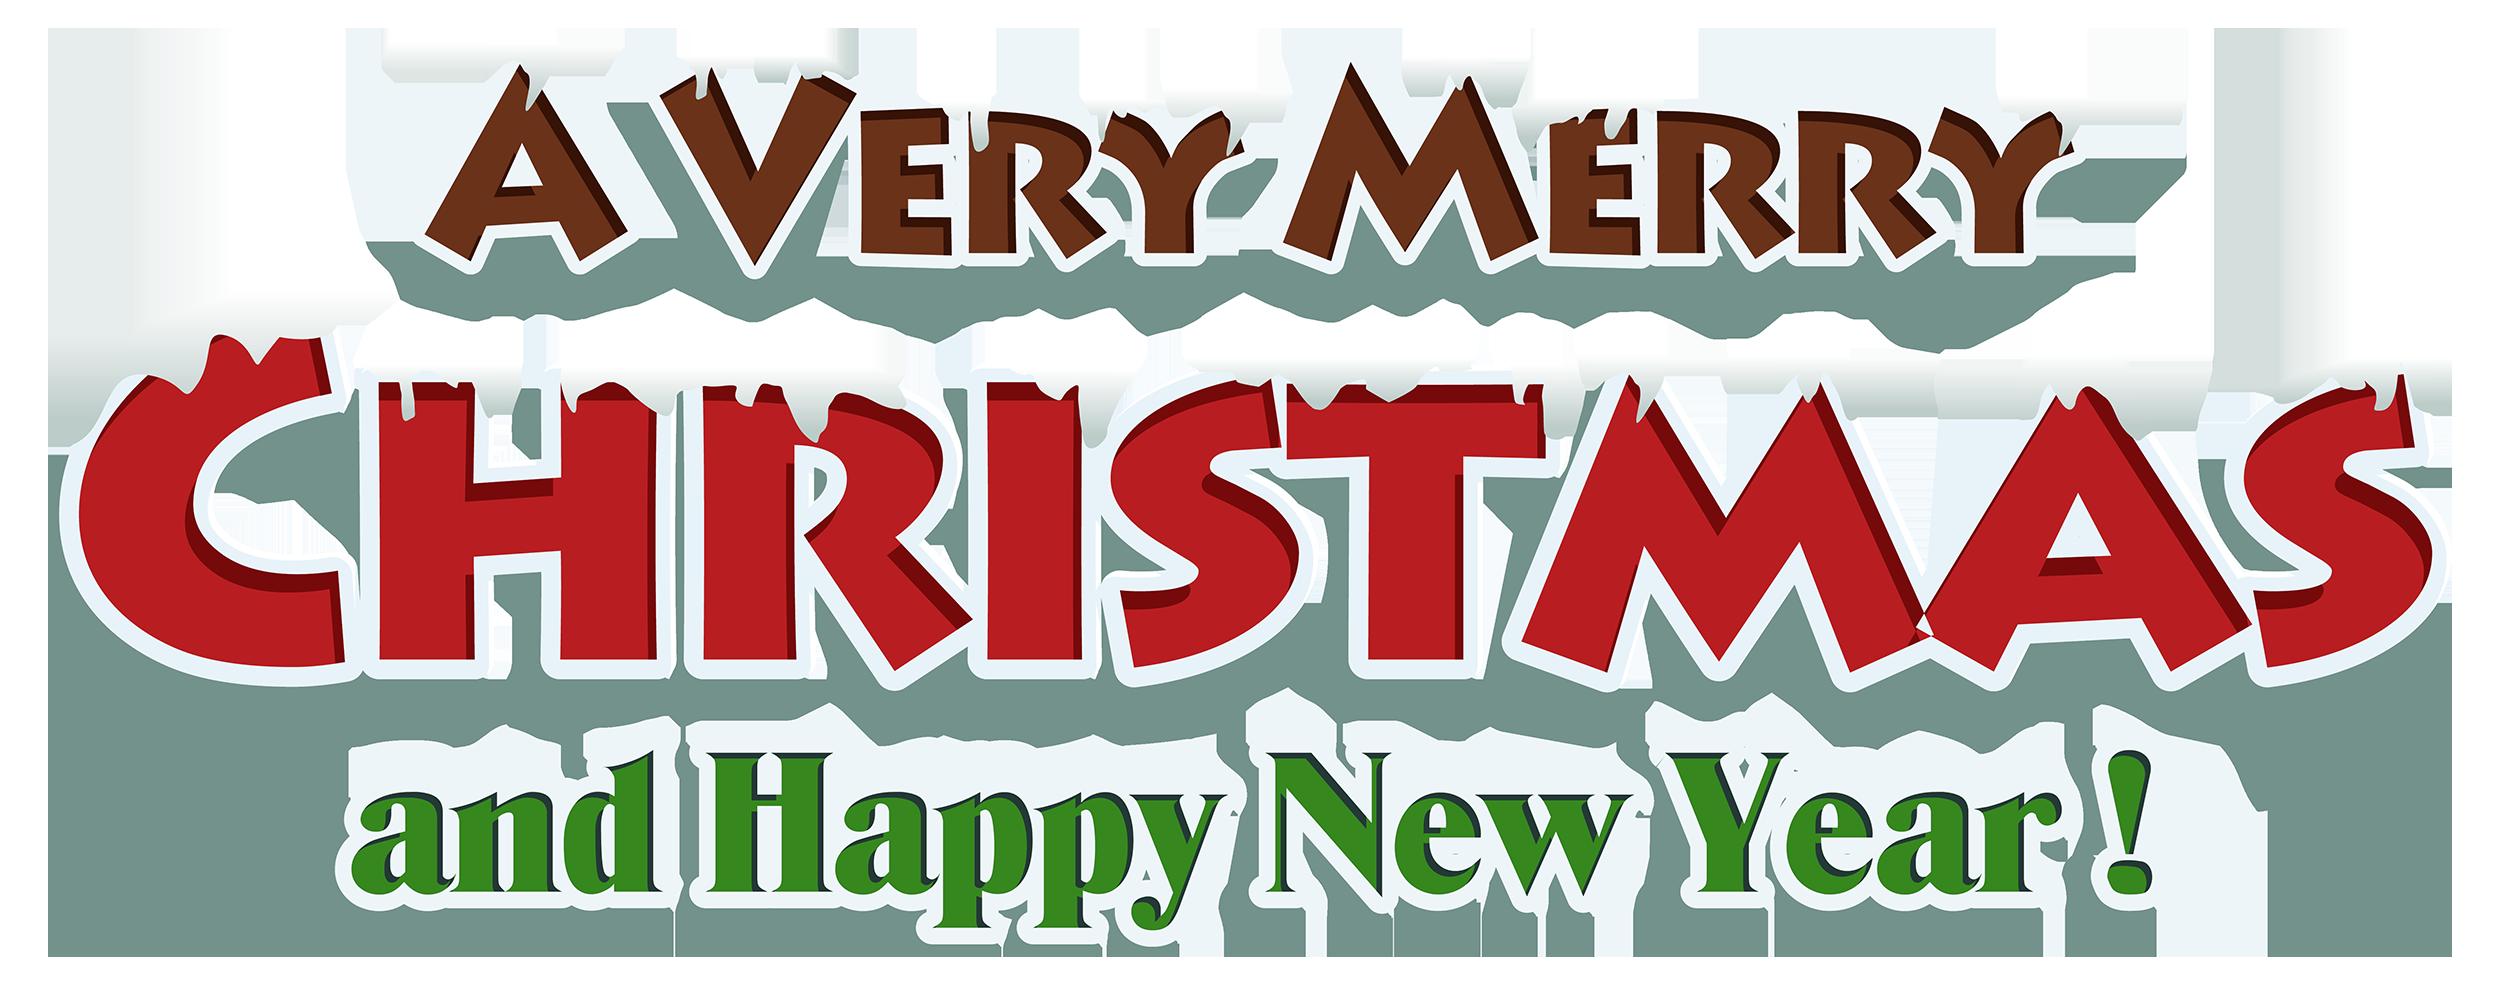 Text clipart merry christmas Christmas text clipart text clipart